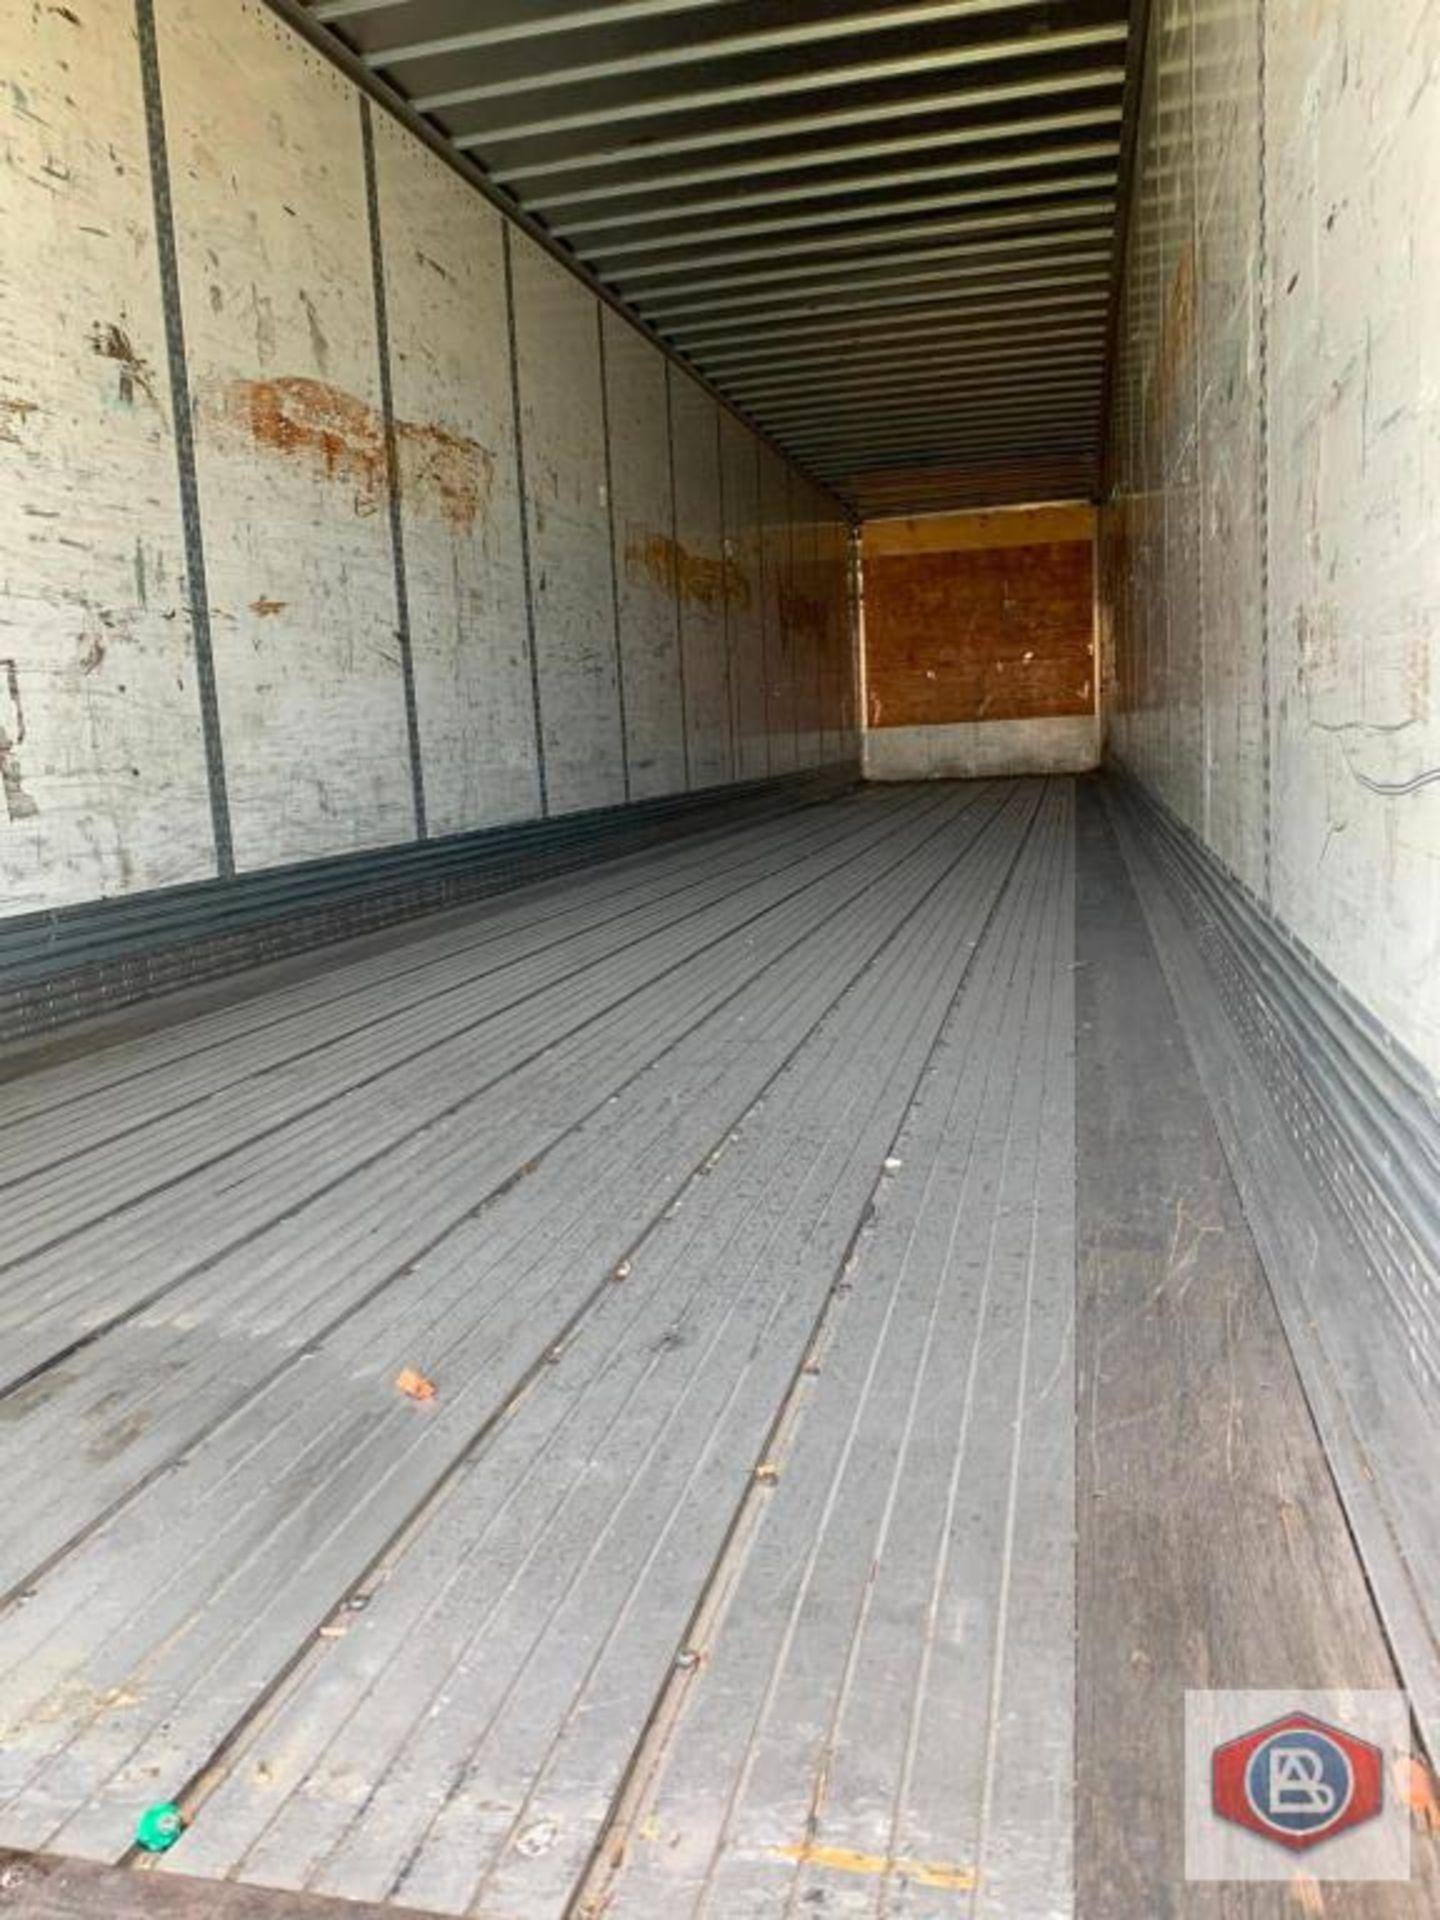 2002 Wabash DuraPlate Logistics Van Trailer 53 ft. - Image 4 of 5